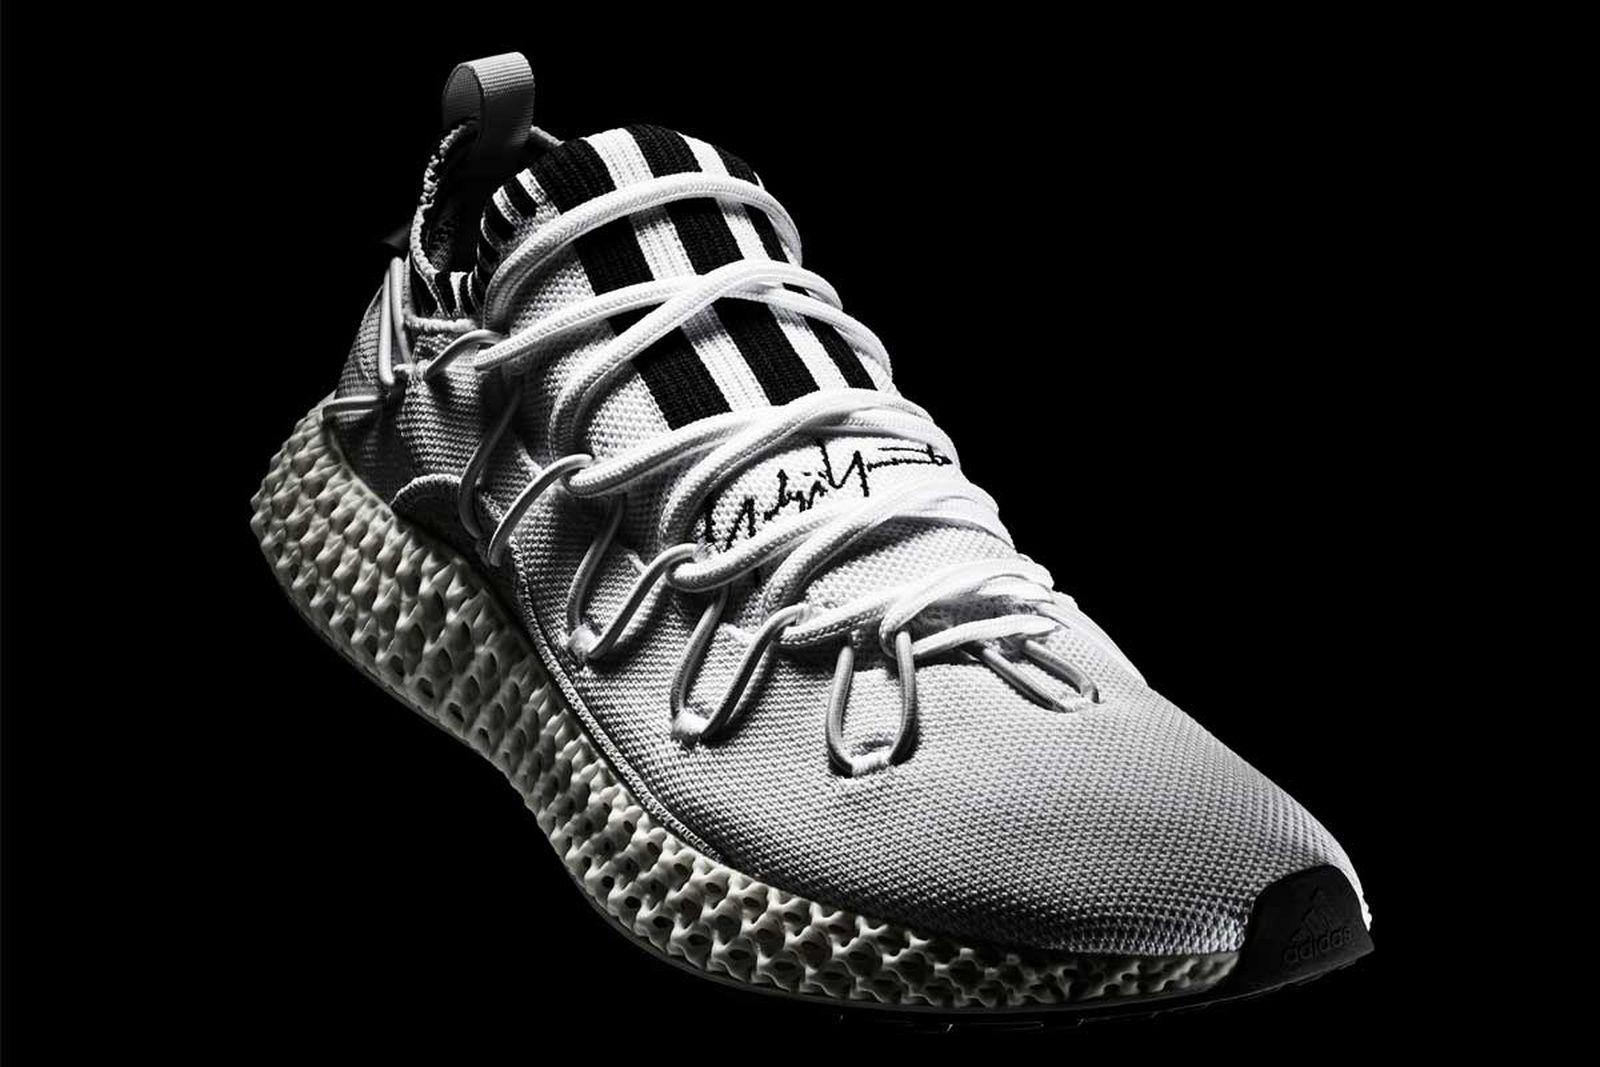 adidas y 3 4d runner bone white release date price y-3